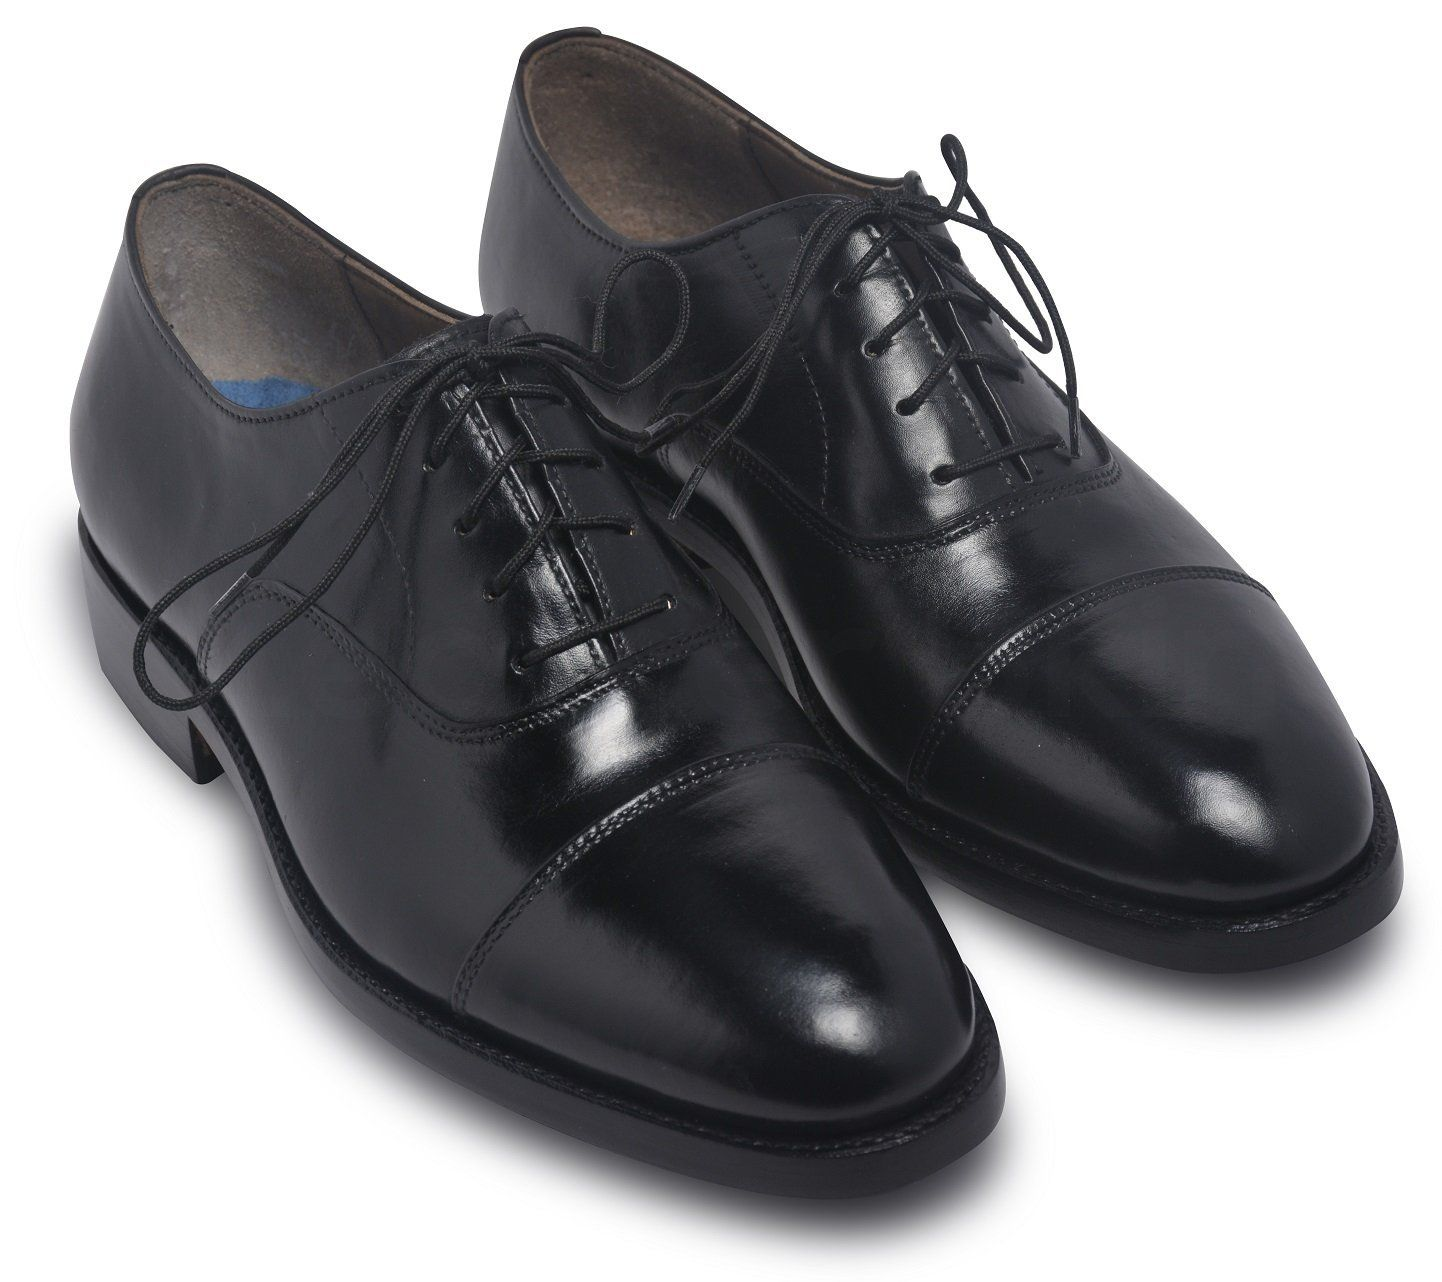 Men Black Oxford Formal Genuine Leather Shoes Black Shoes Men Dress Shoes Men Black Oxford Shoes [ 1282 x 1442 Pixel ]